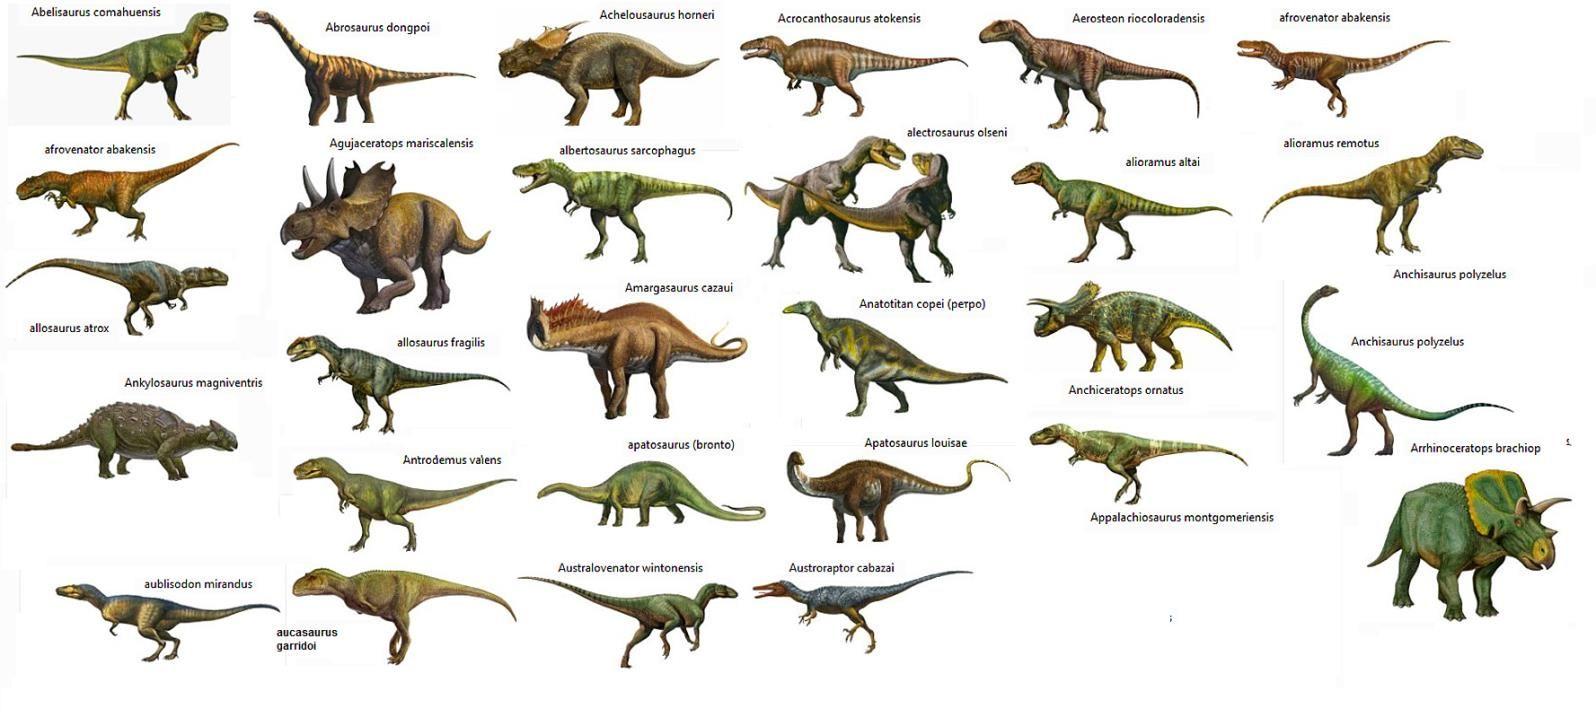 DINOSAURS A http//s6.uploads.ru/J34It.jpg Abelisaurus